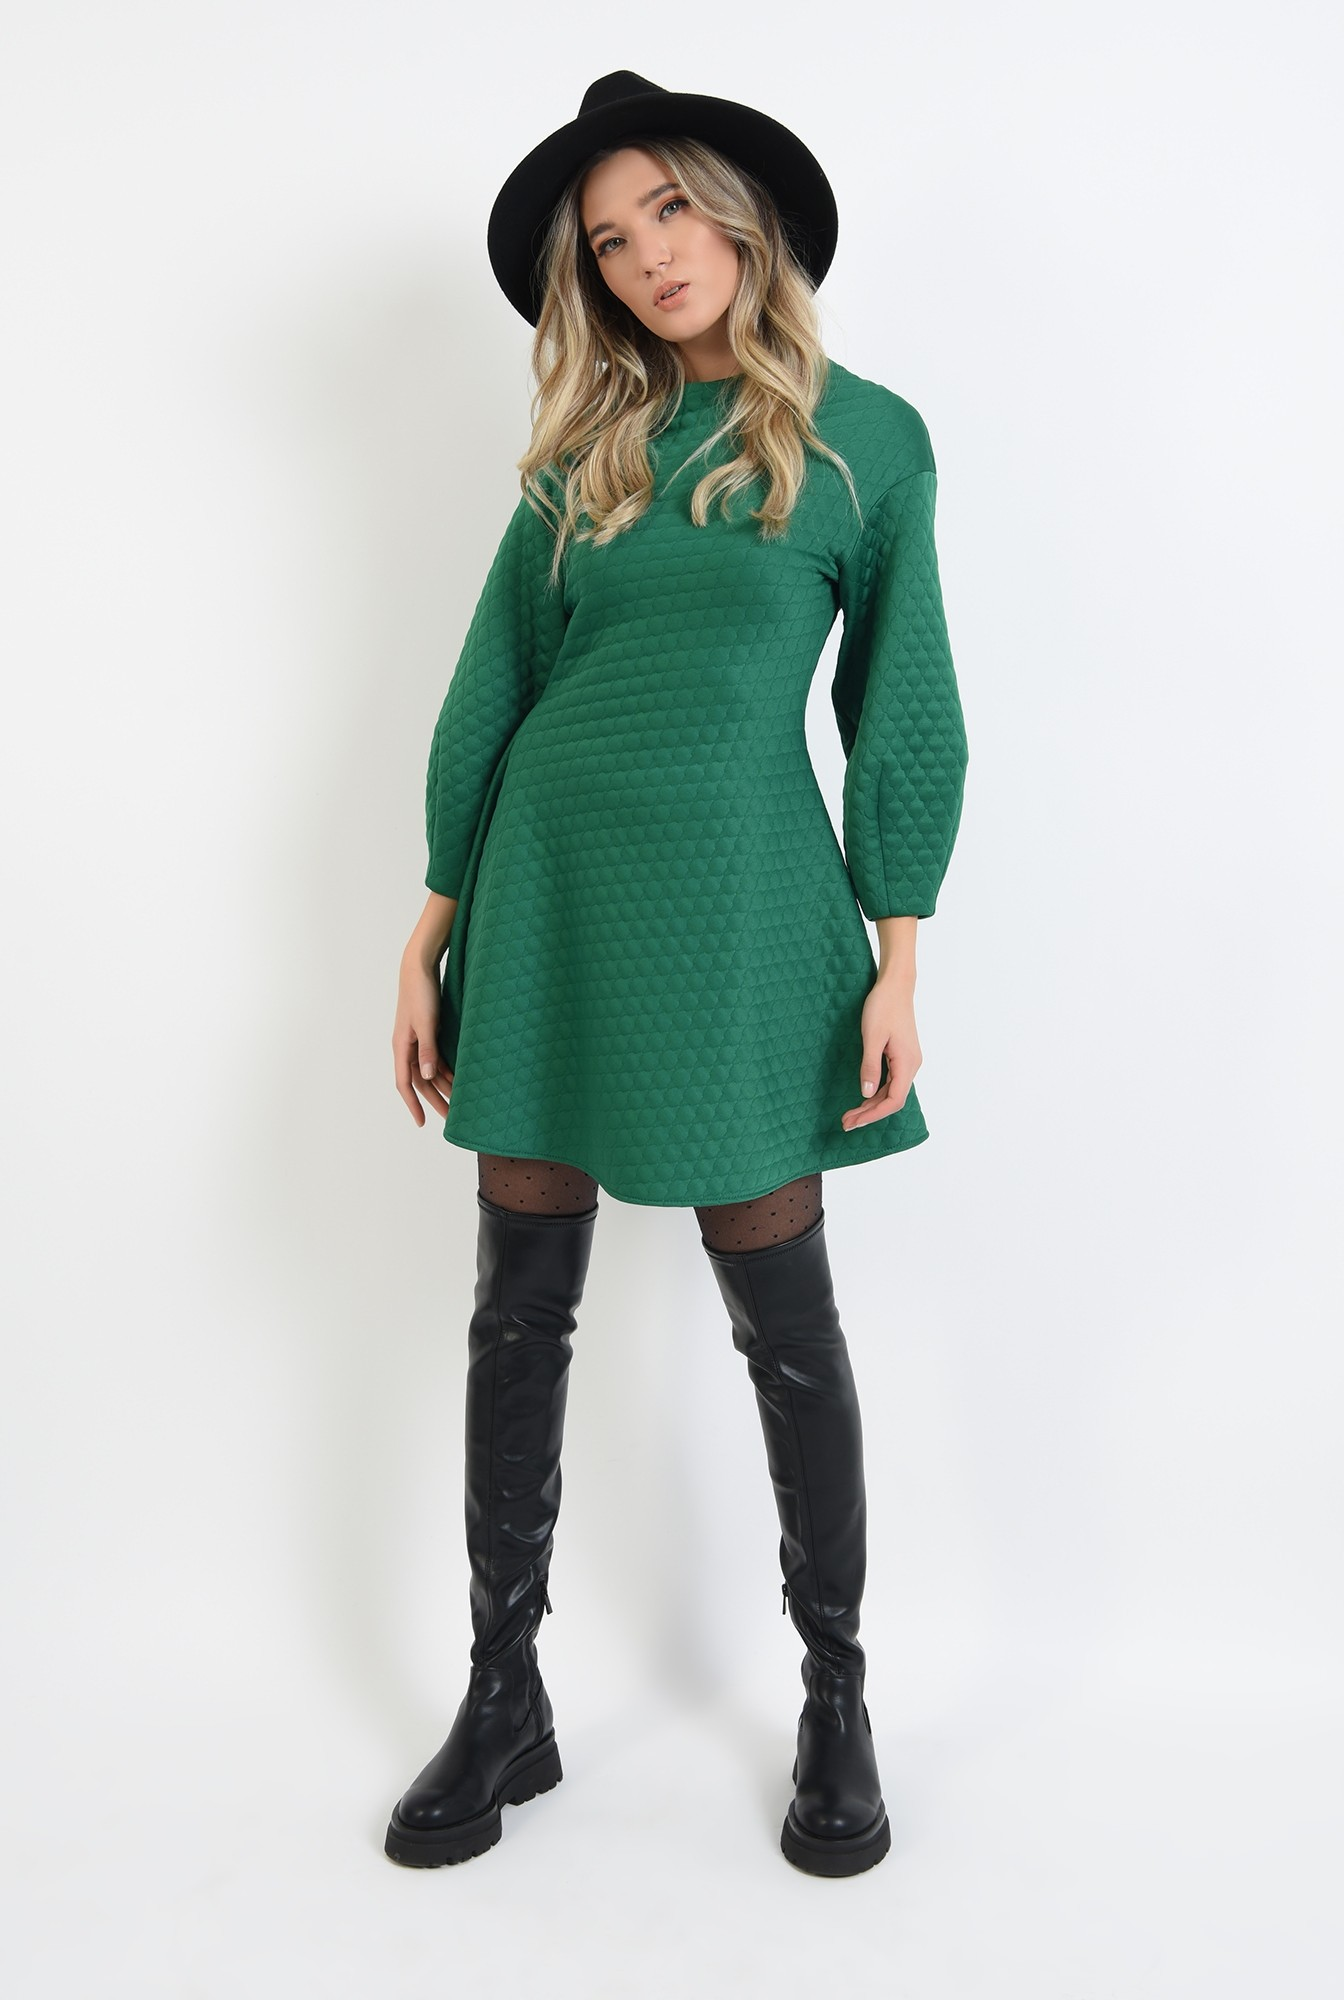 1 - rochie din material matlasat, verde, scurta, evazata